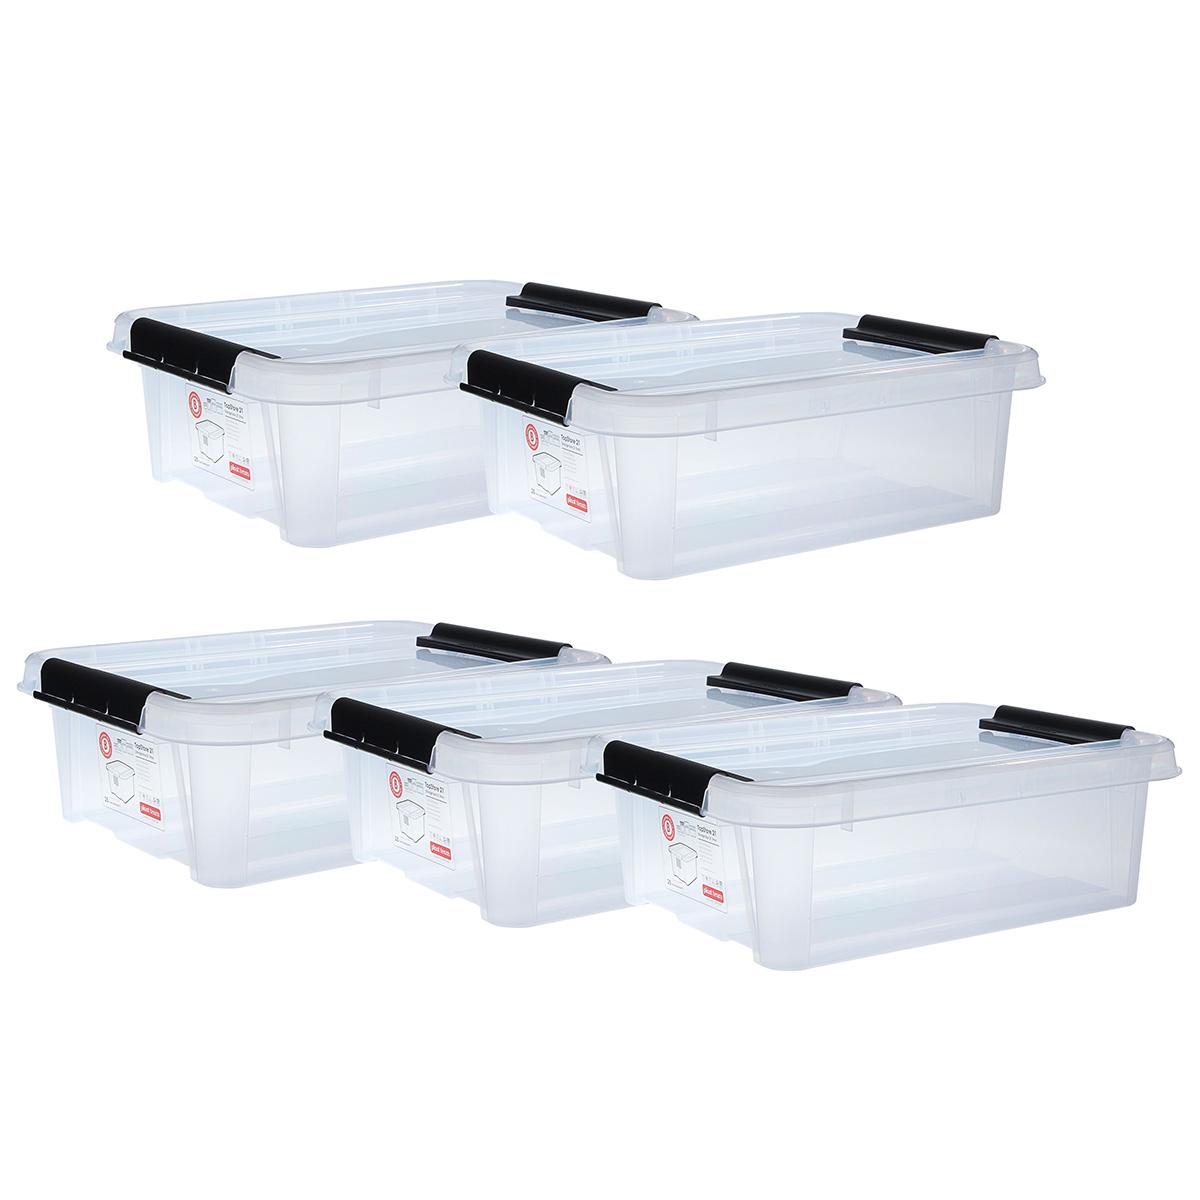 Top store opbevaringskasser - 21 liter